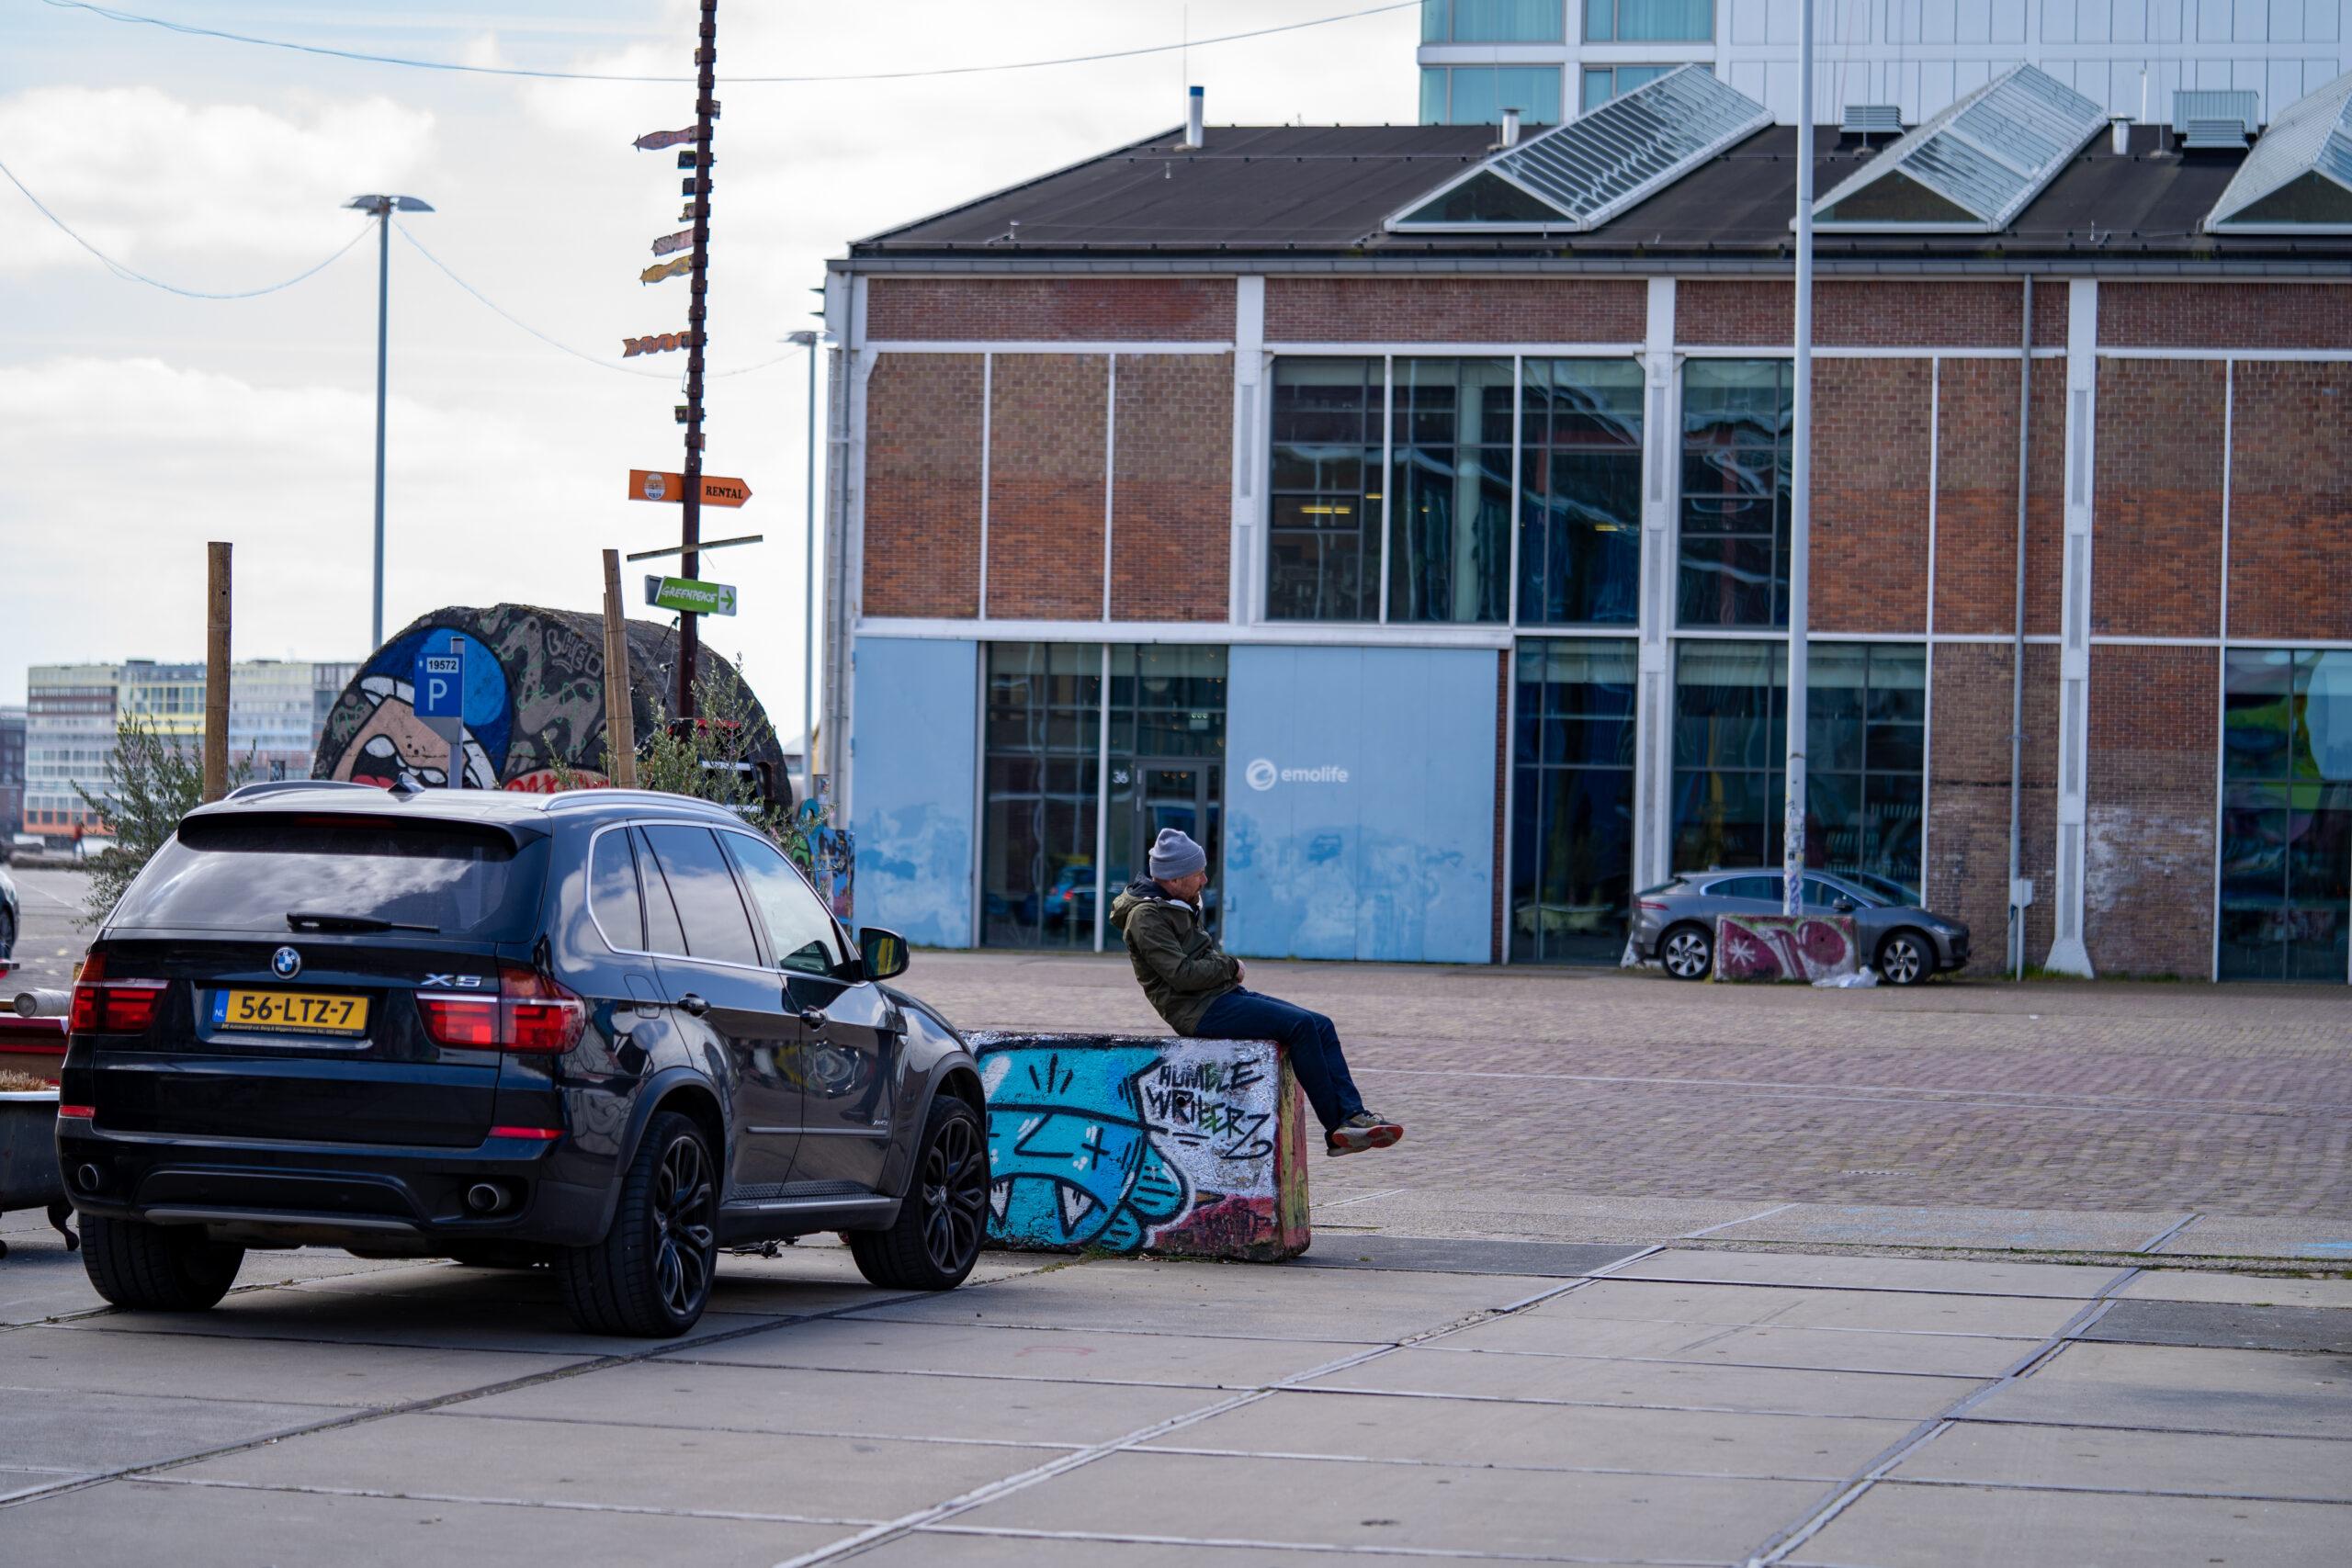 Peter Becker lente.shoot bij NDSM-werf in Amsterdam